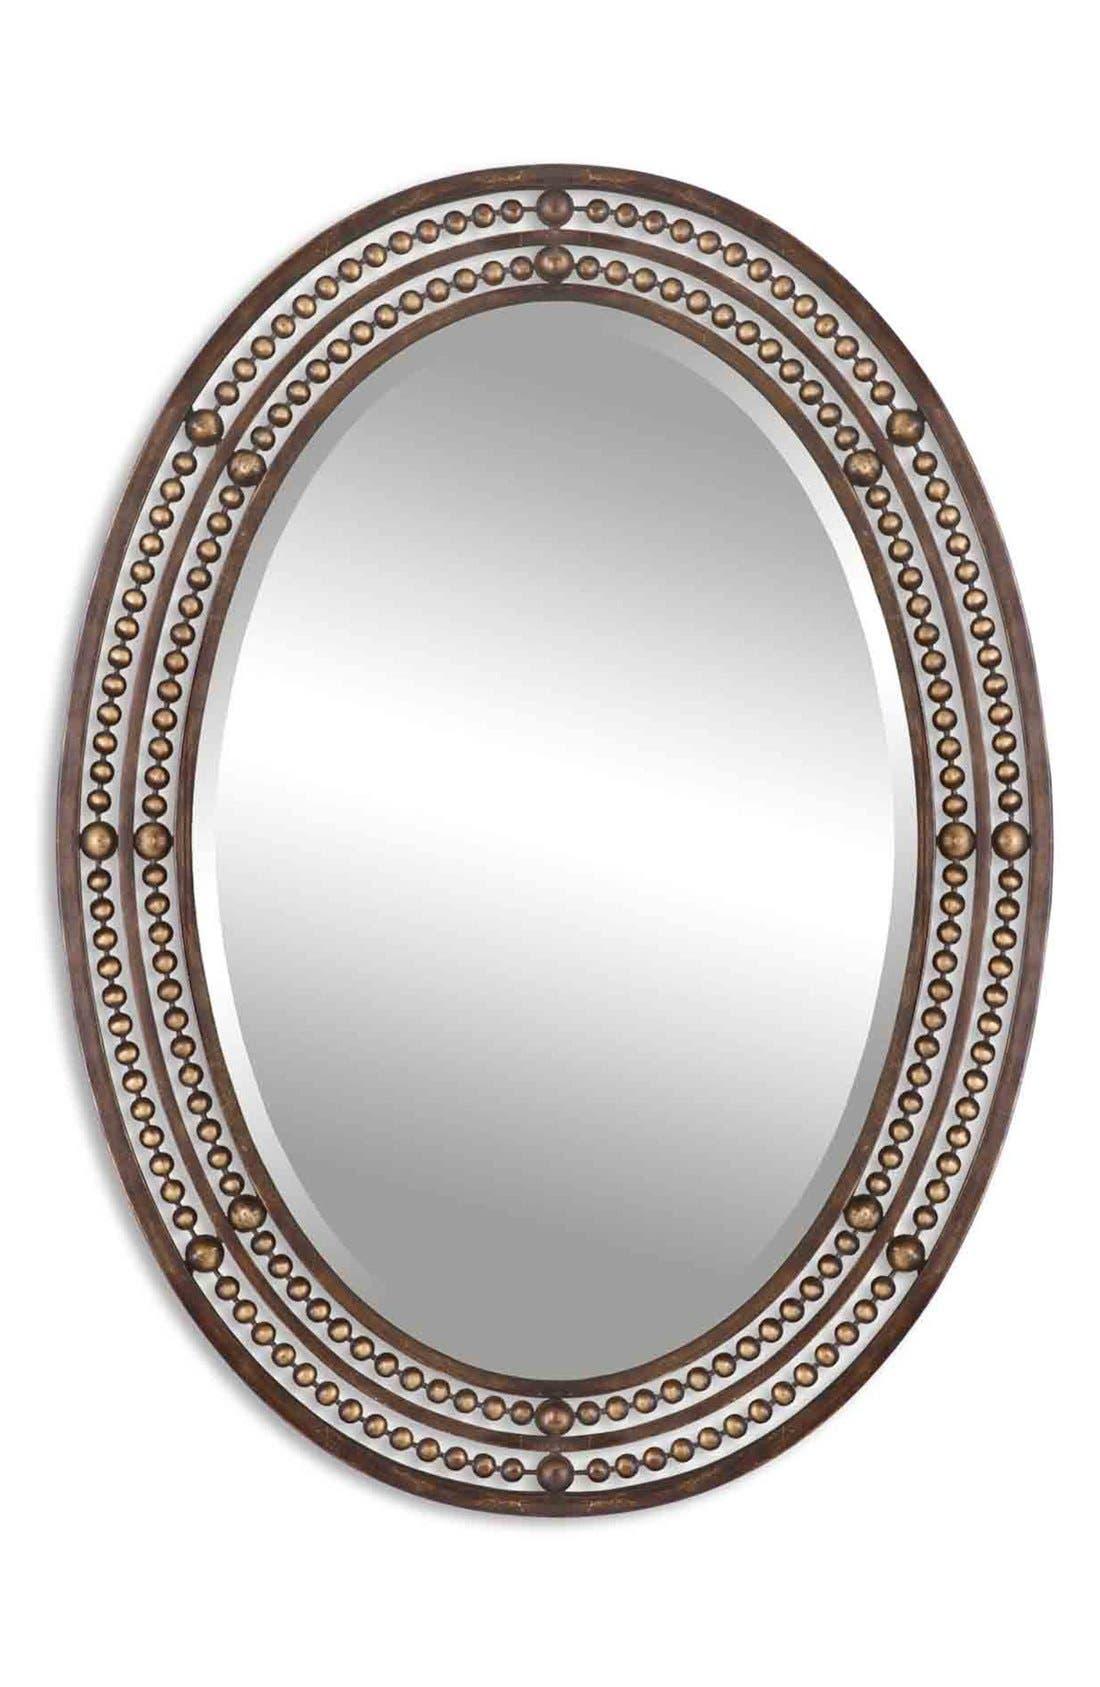 Uttermost U0027Matneyu0027 Distressed Bronze Oval Wall Mirror